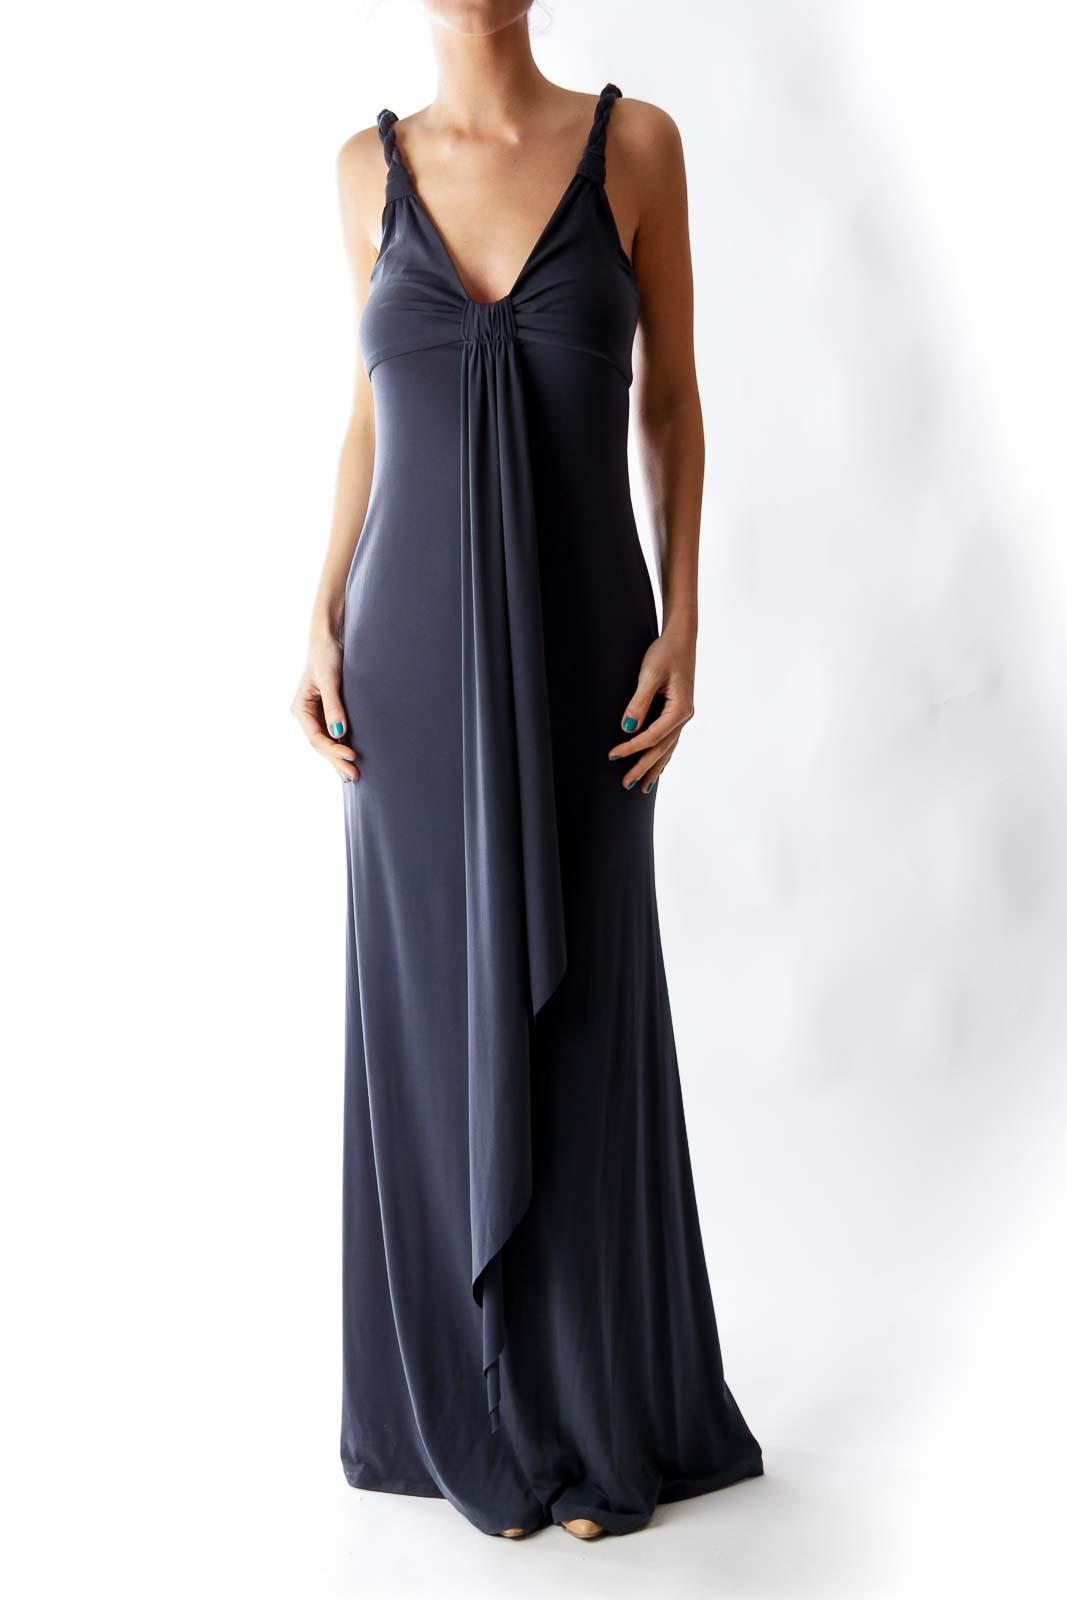 Gray Braid Maxi Dress Front